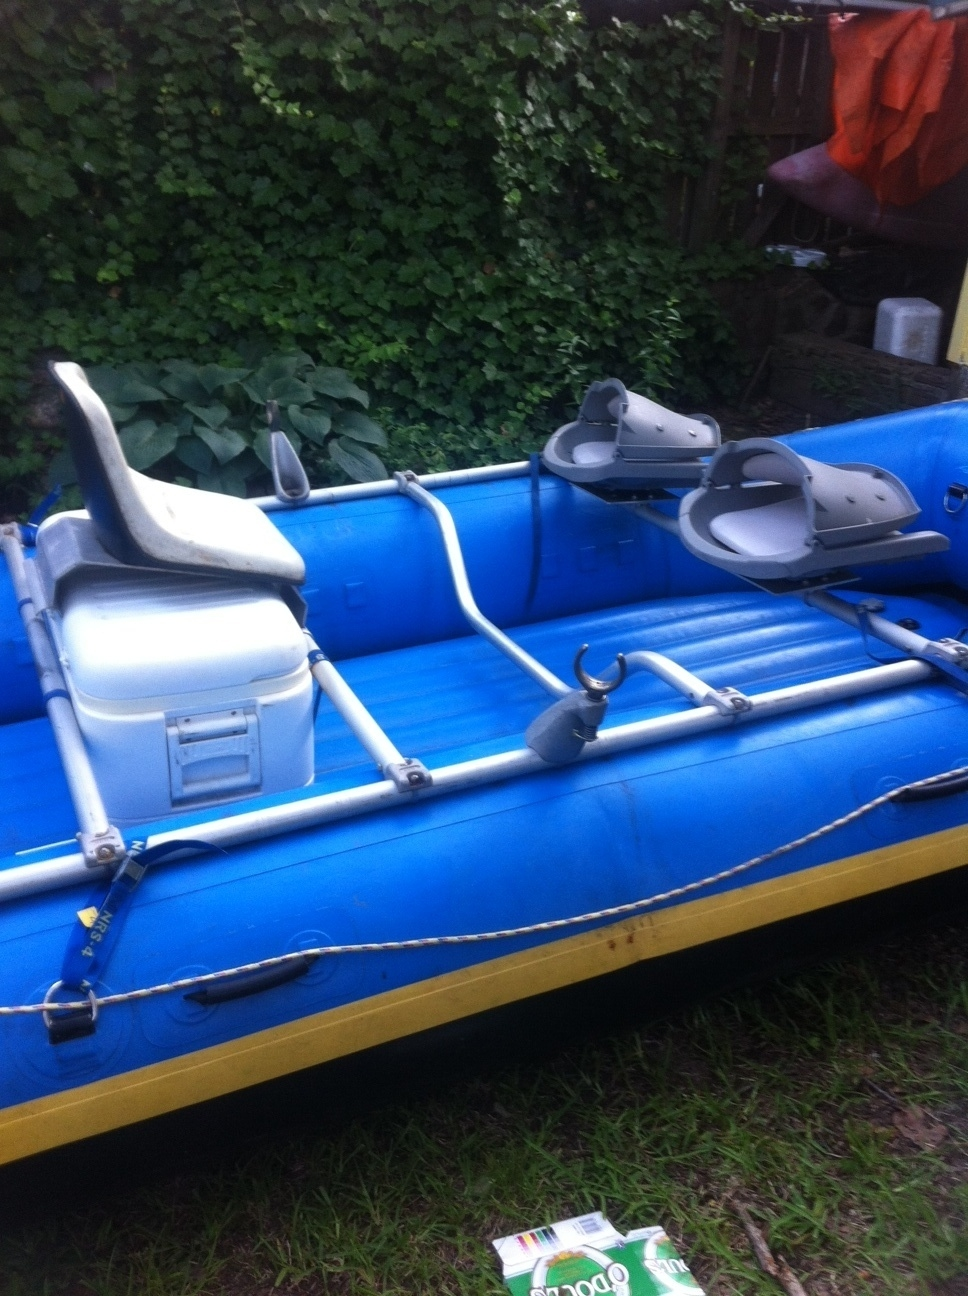 Click image for larger version  Name:cooler raft.jpg Views:200 Size:746.9 KB ID:8571